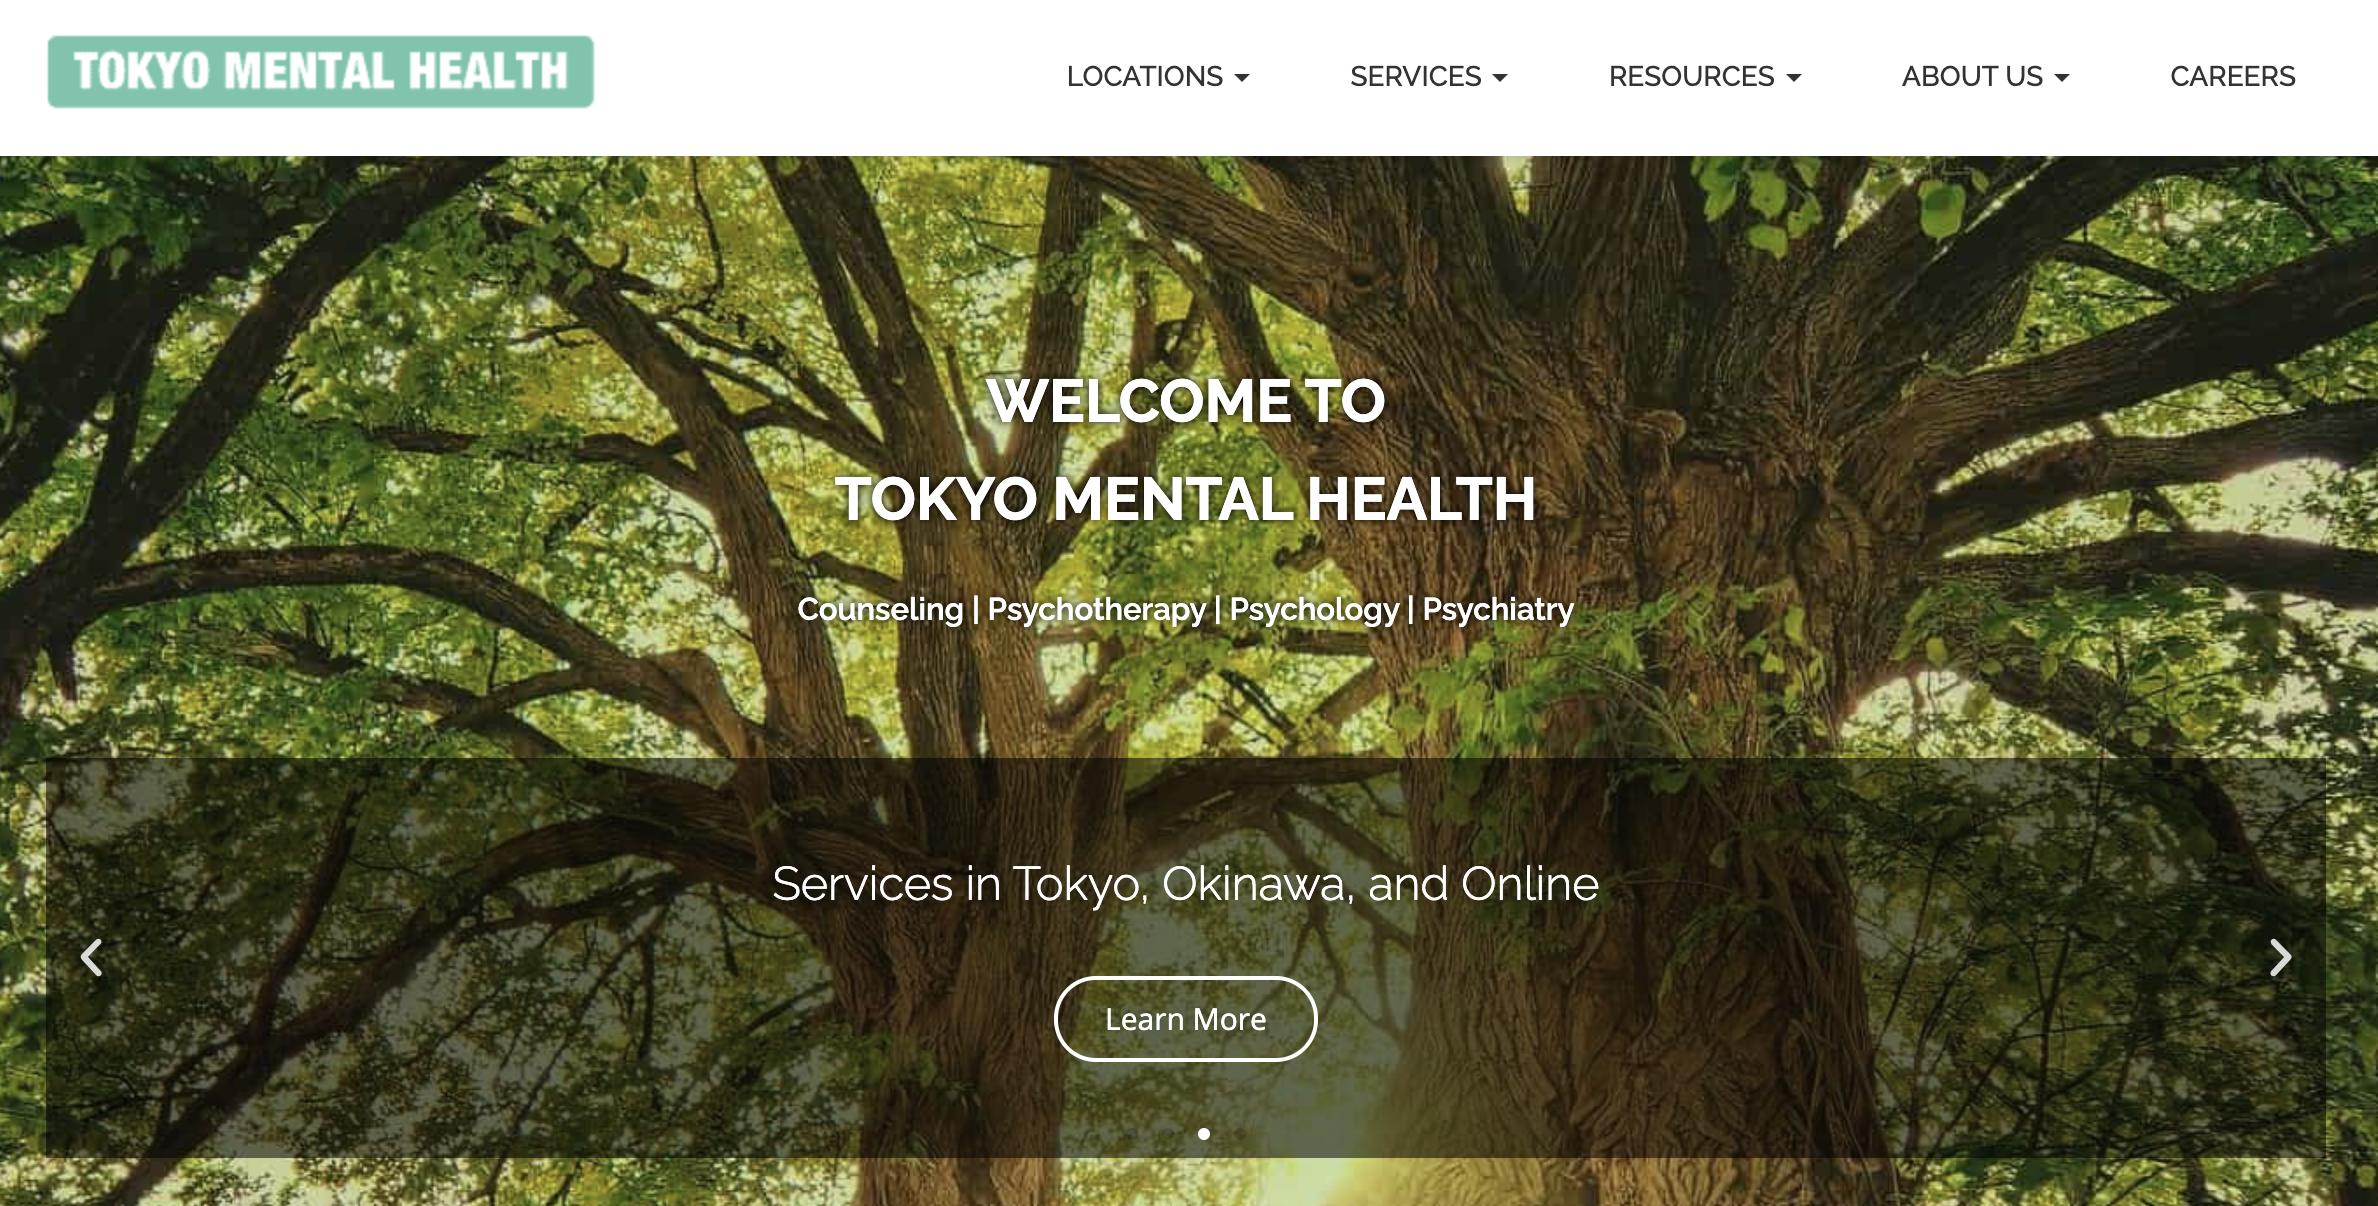 Tokyo Mental Health